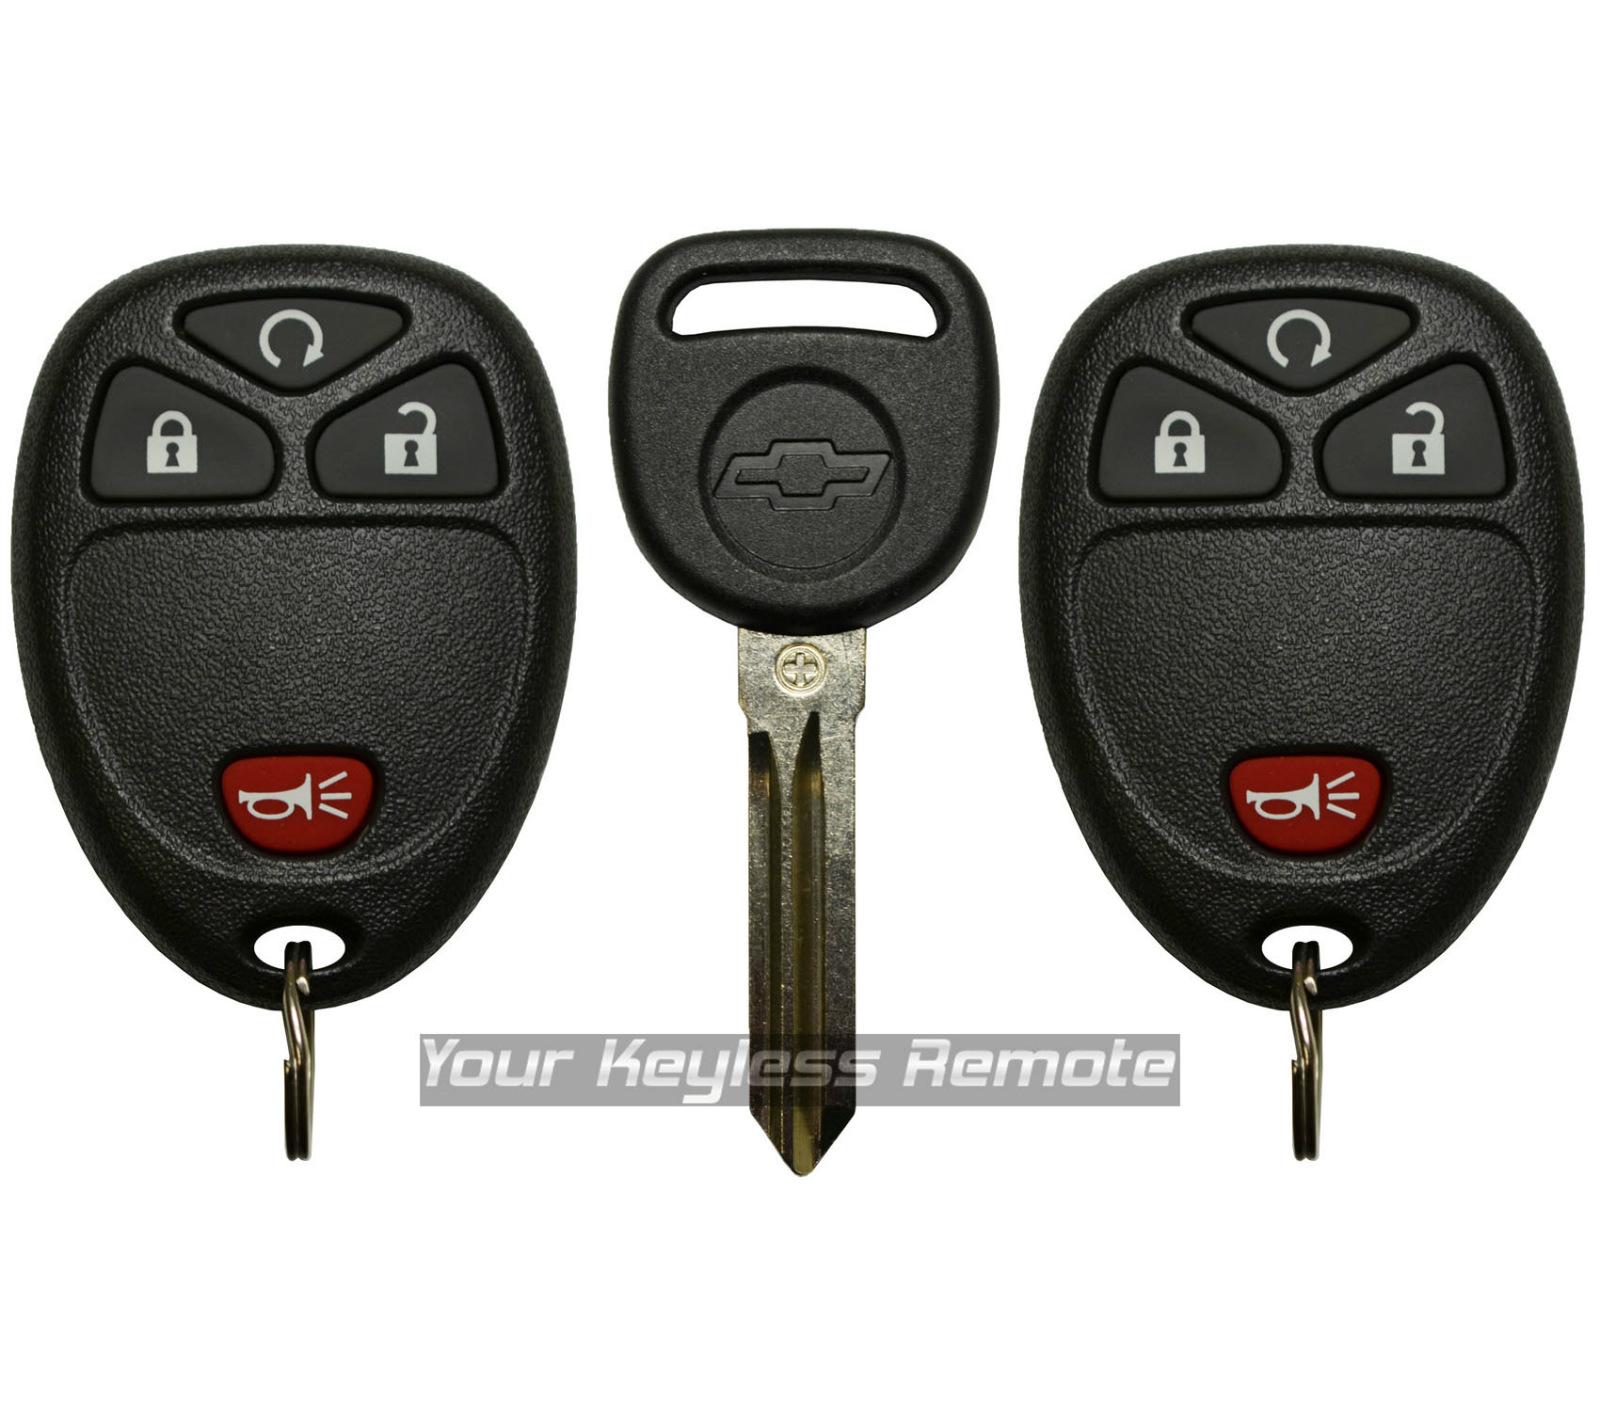 2 new replacement remote start keyless fob logo ignition transponder key van ebay. Black Bedroom Furniture Sets. Home Design Ideas